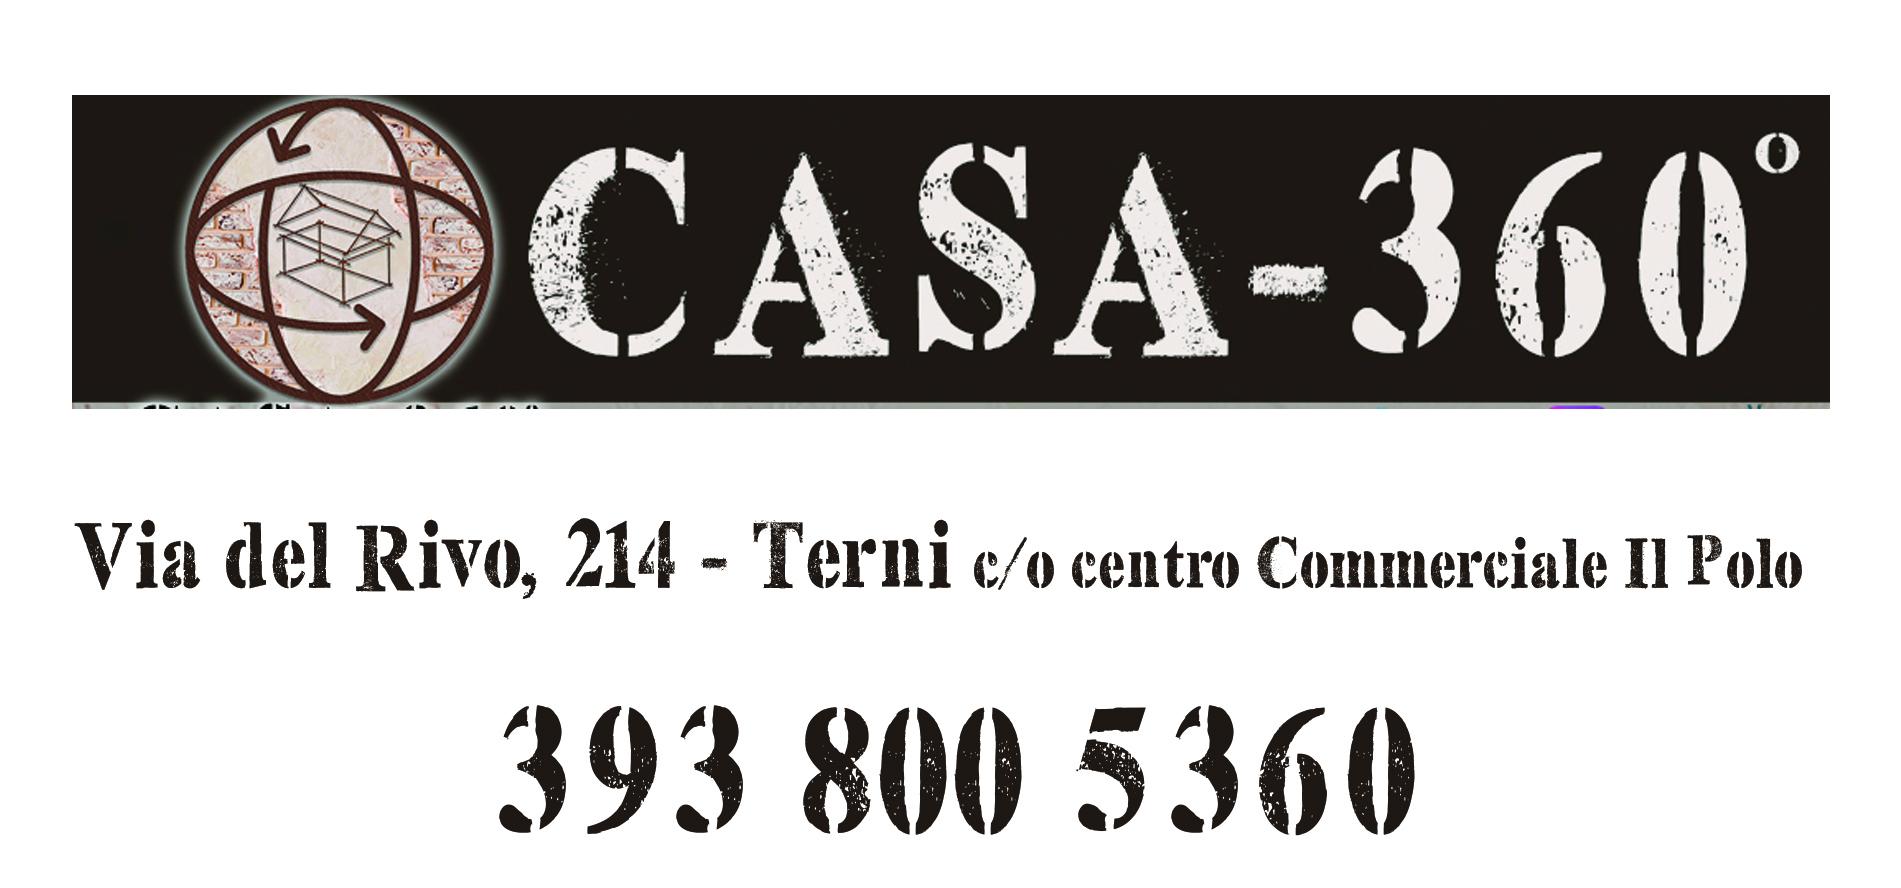 CASA-360 DI MATTEO SARGENTINI